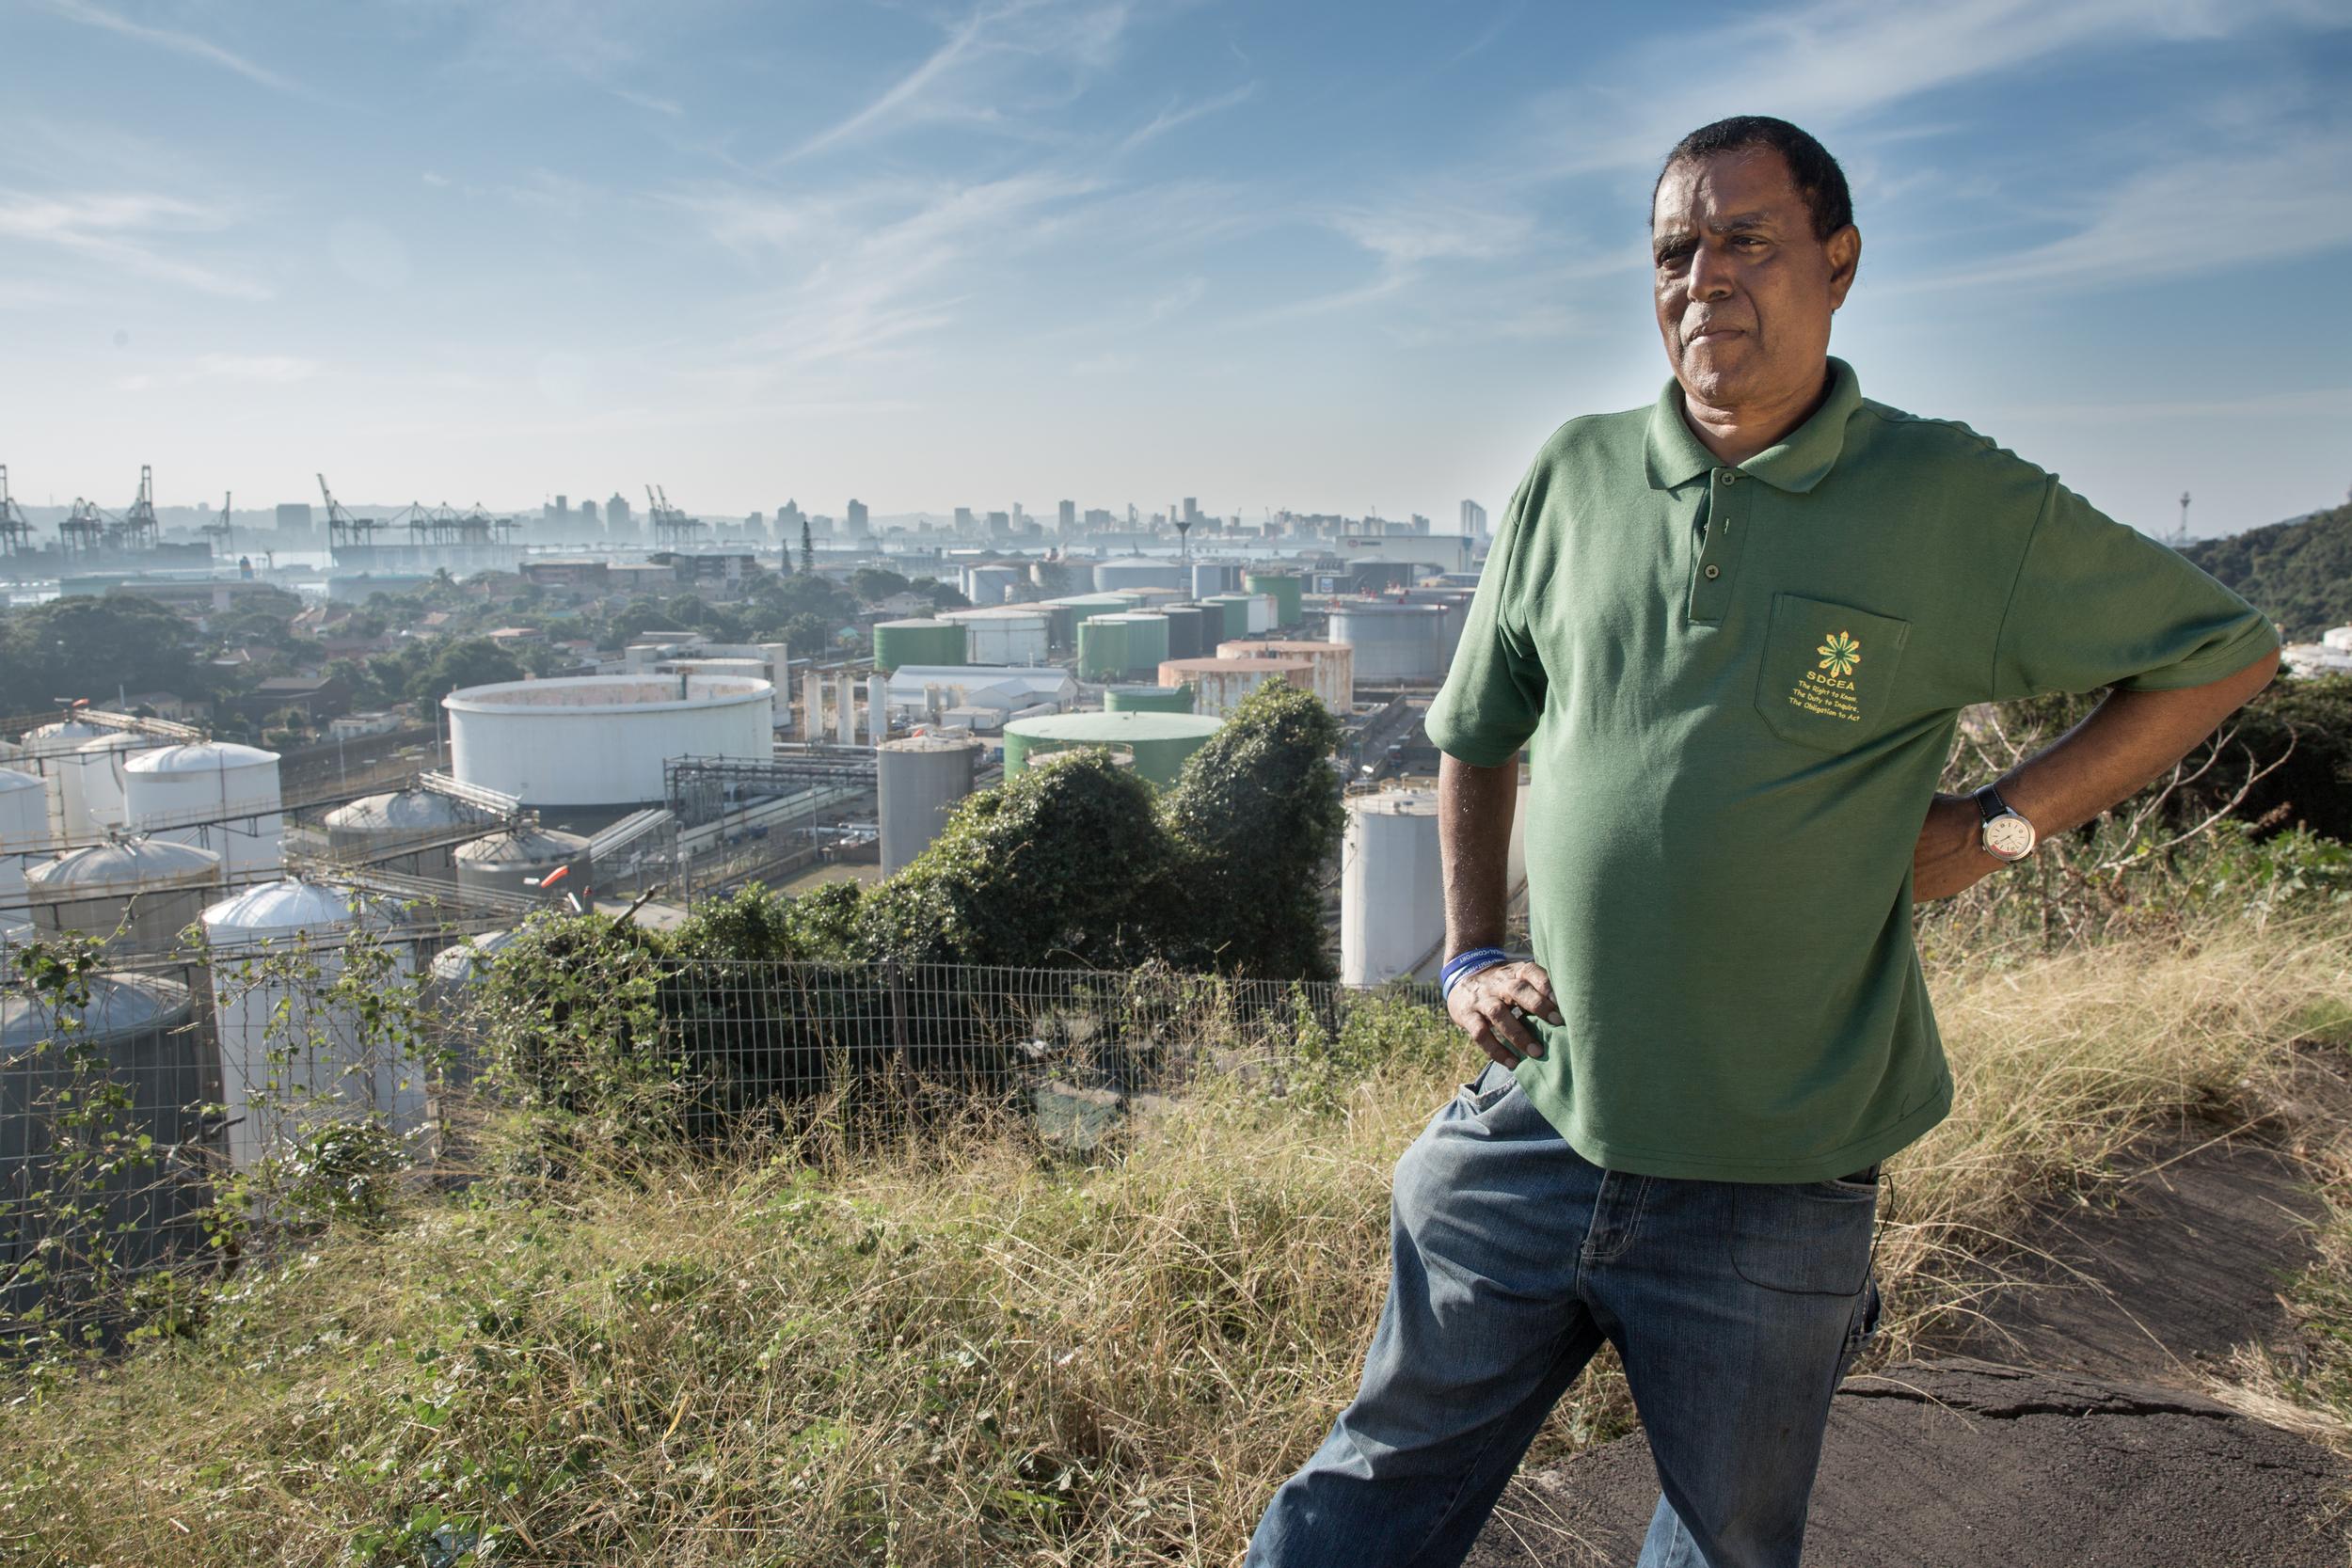 Desmond D'sa - Organizer for The South Durban Community Environmental Alliance (SDCEA)